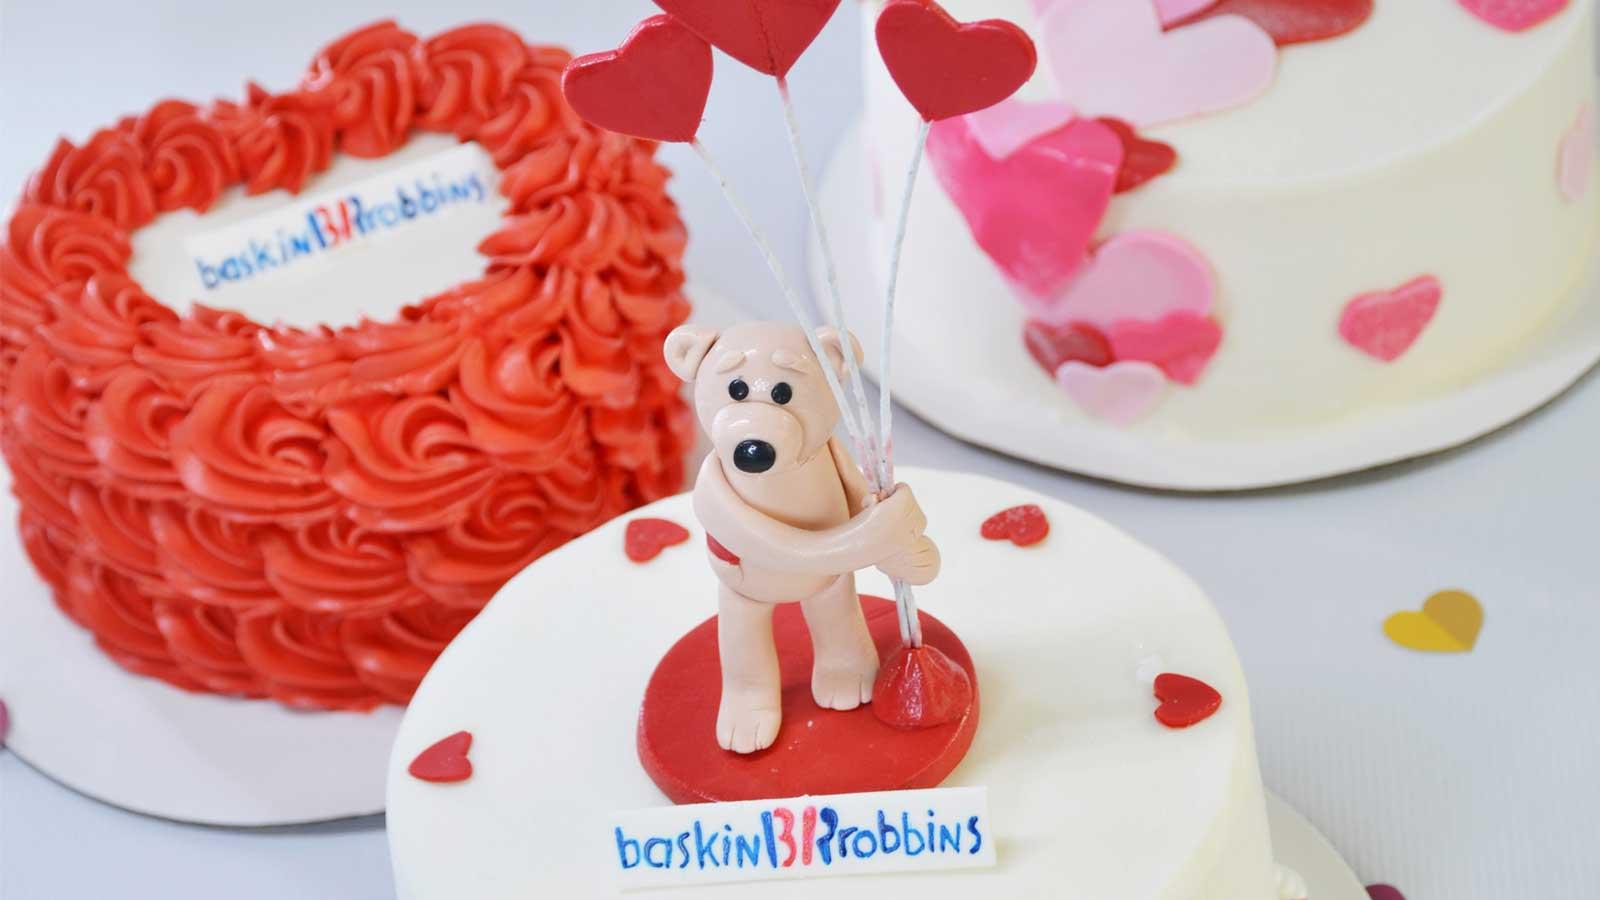 Celebrate love with Baskin-Robbins